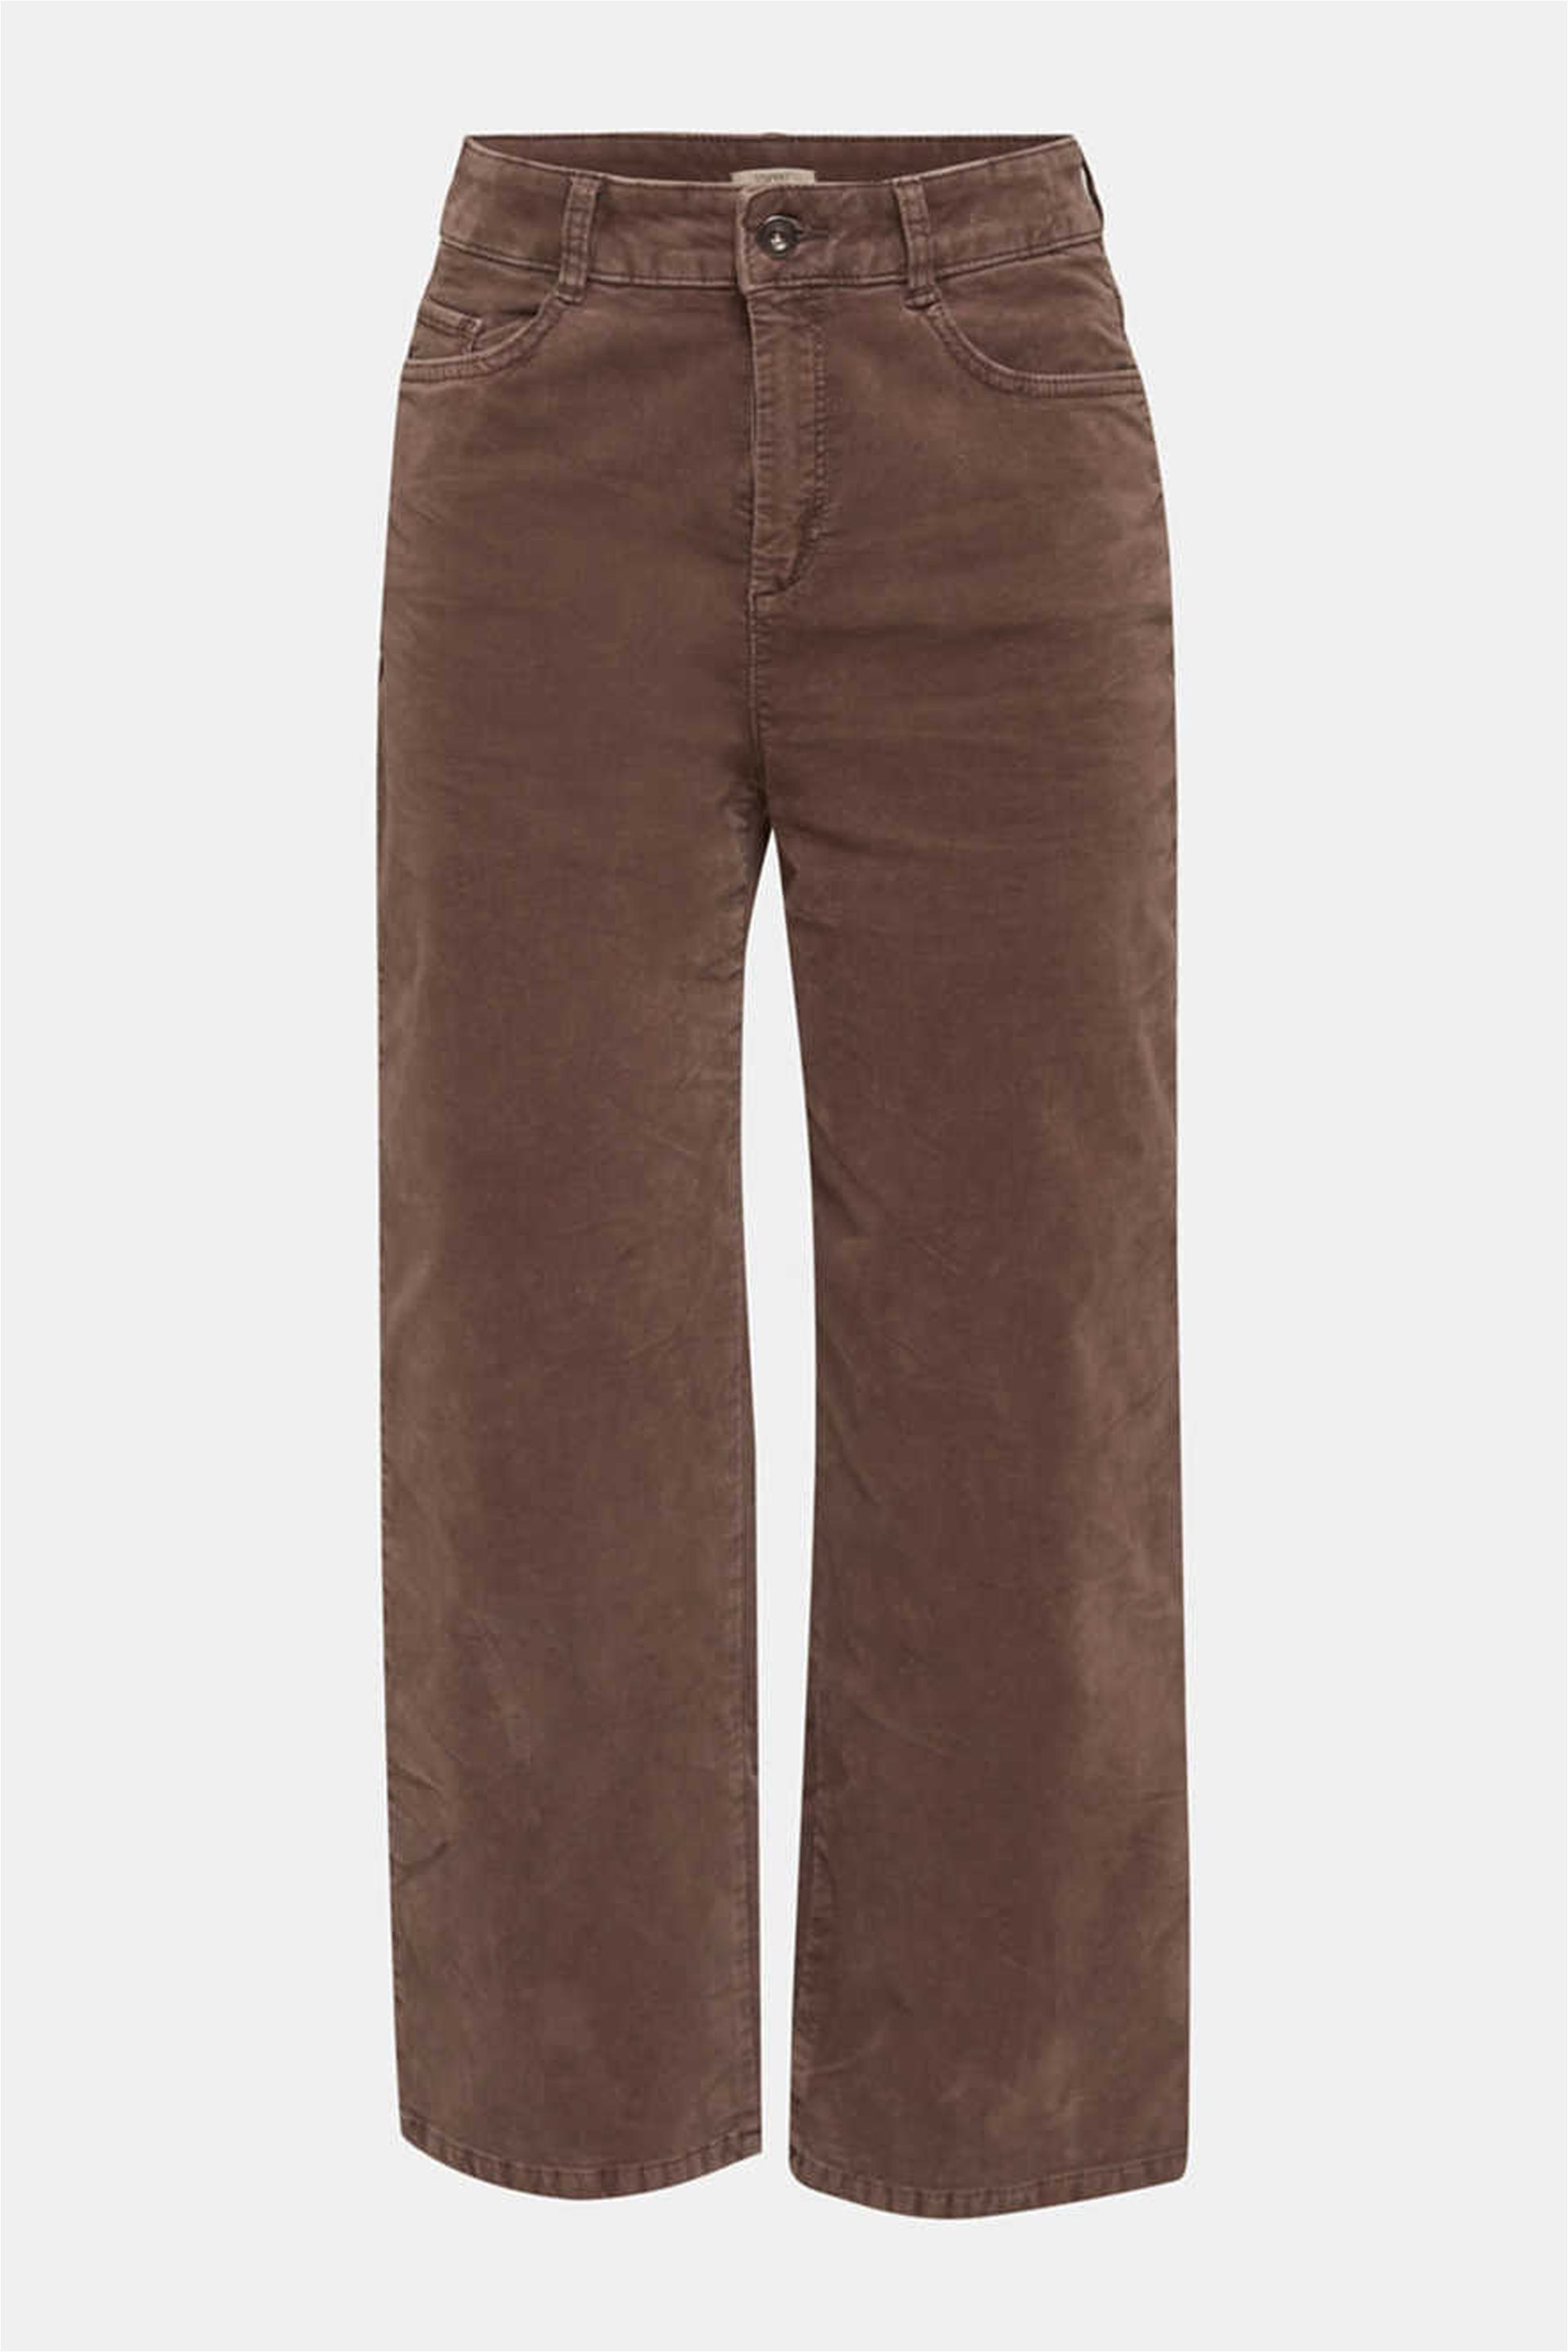 Esprit γυναικείο βελούδινο cropped παντελόνι - 129EE1B031 - Καφέ